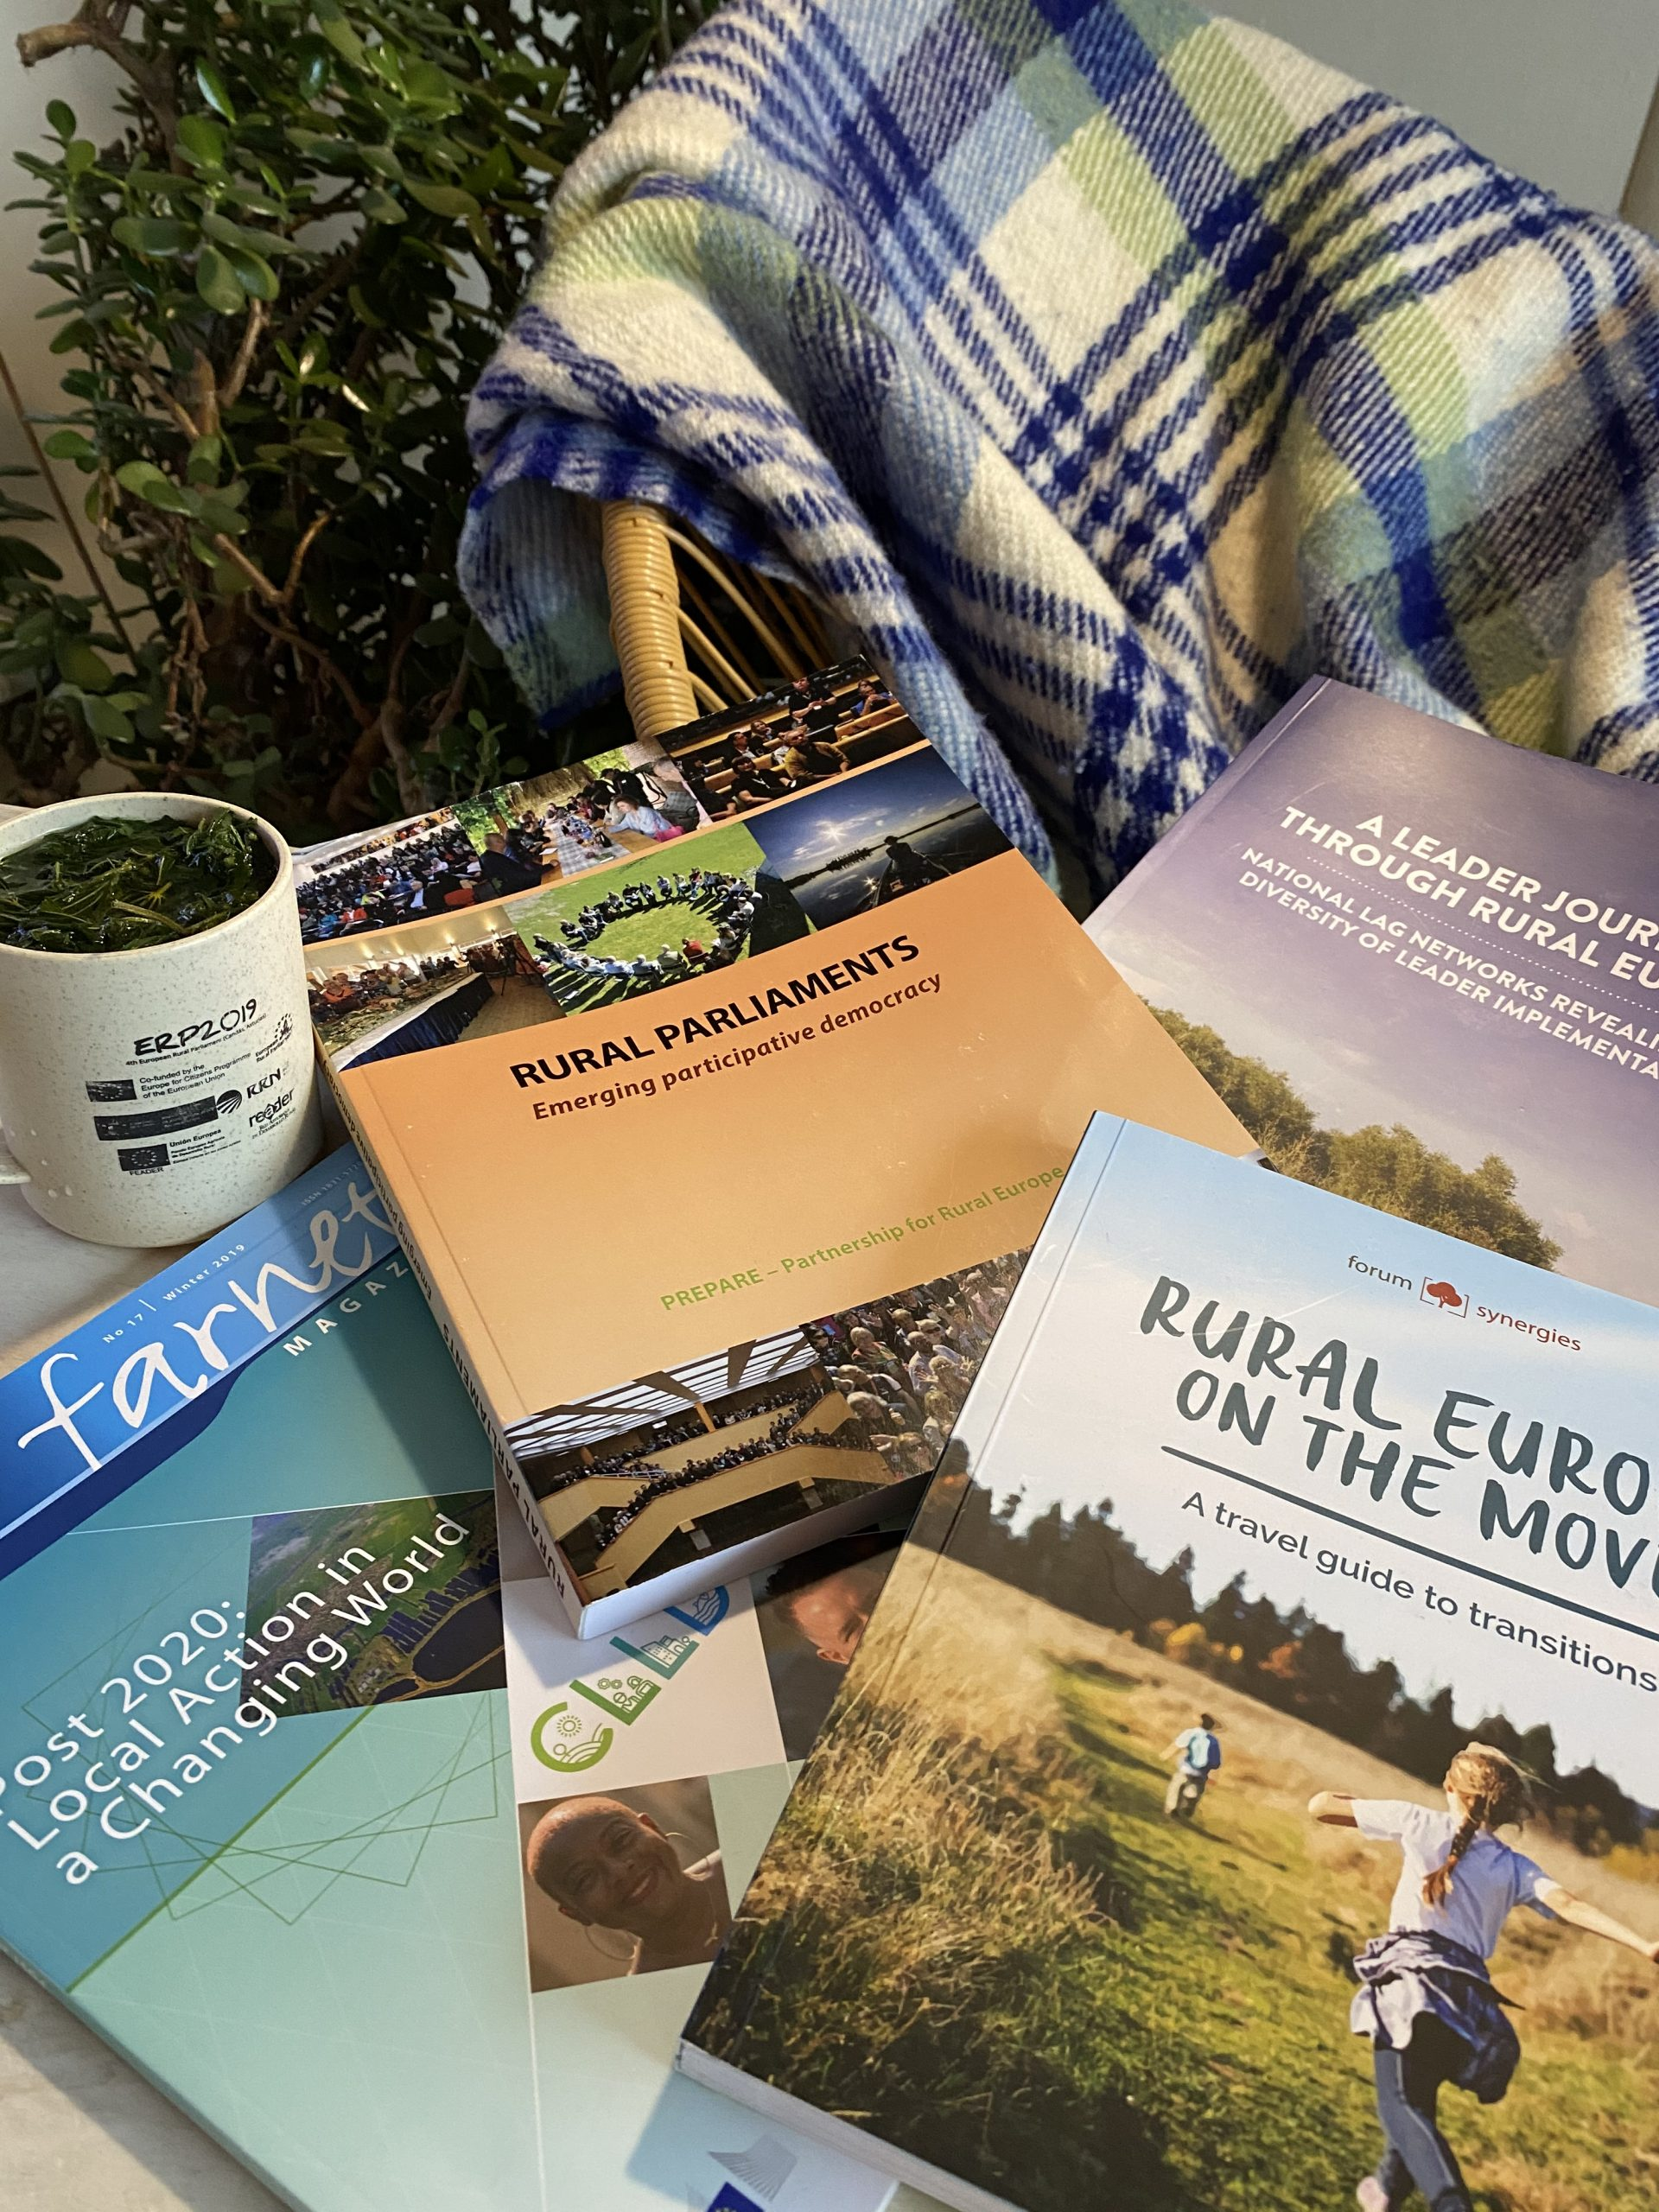 Inspirational books about Rural development